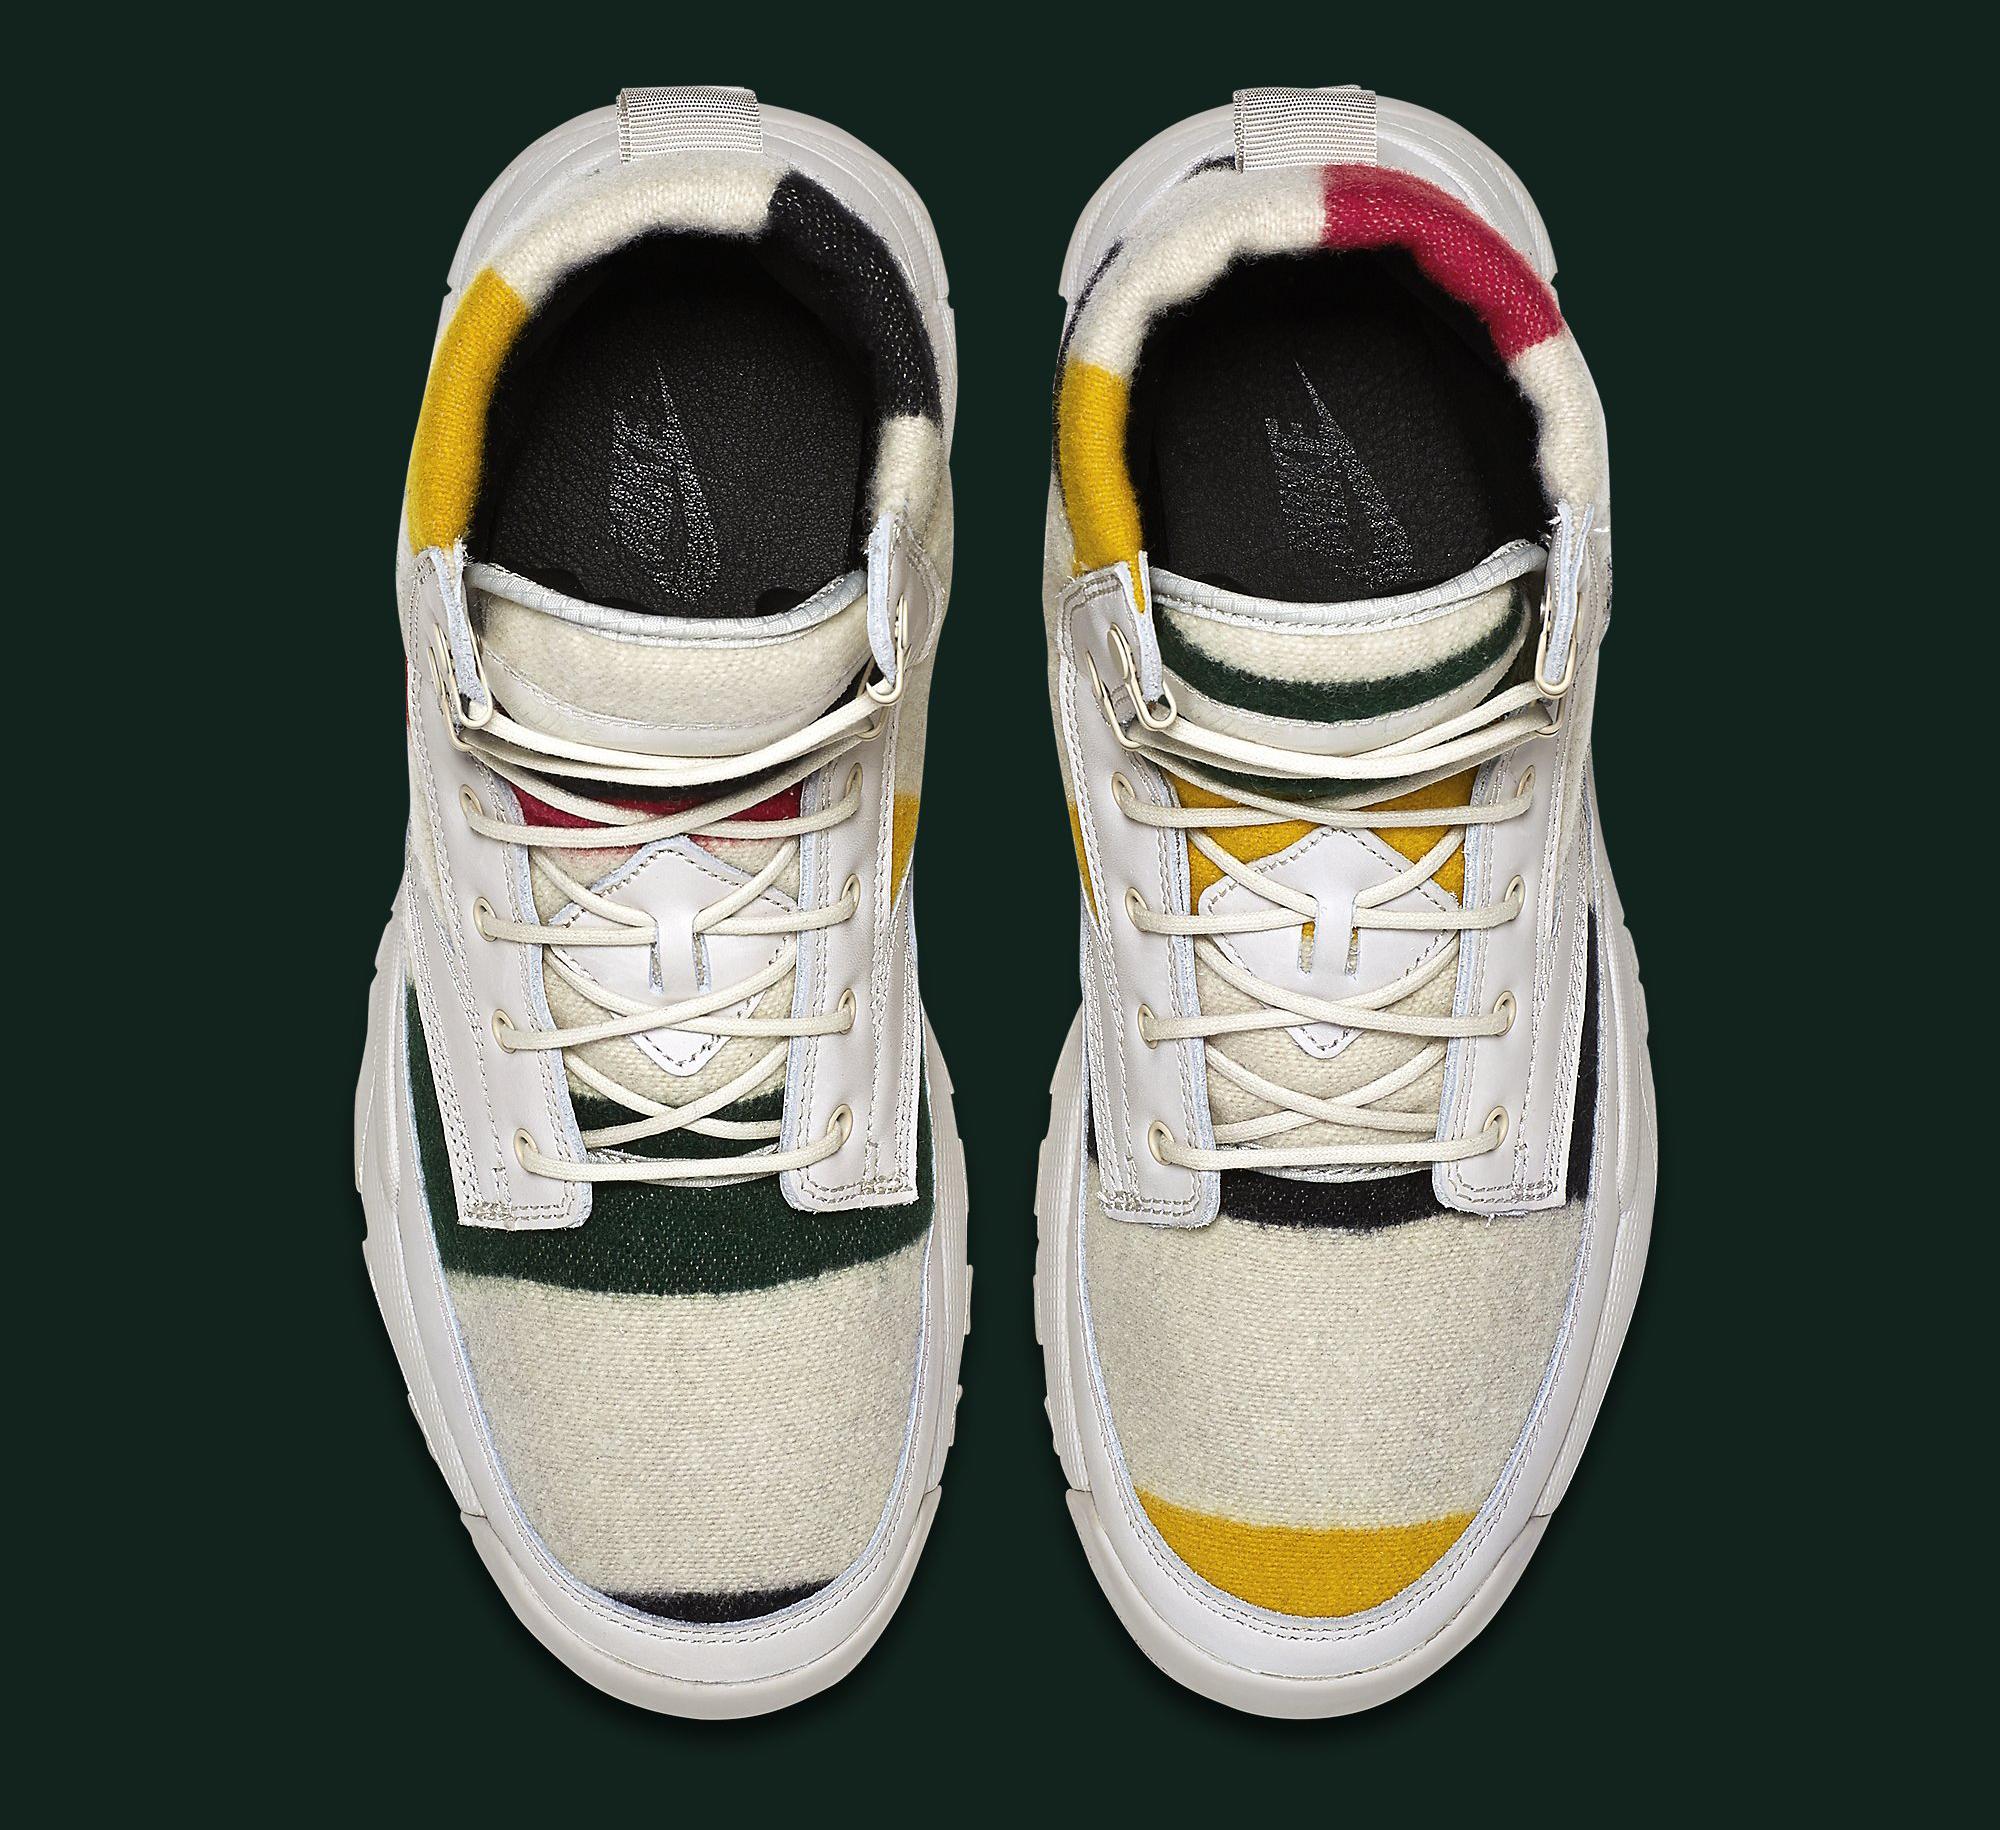 Pendleton Nike SFB 6 Inch Boot 875040-101 Top